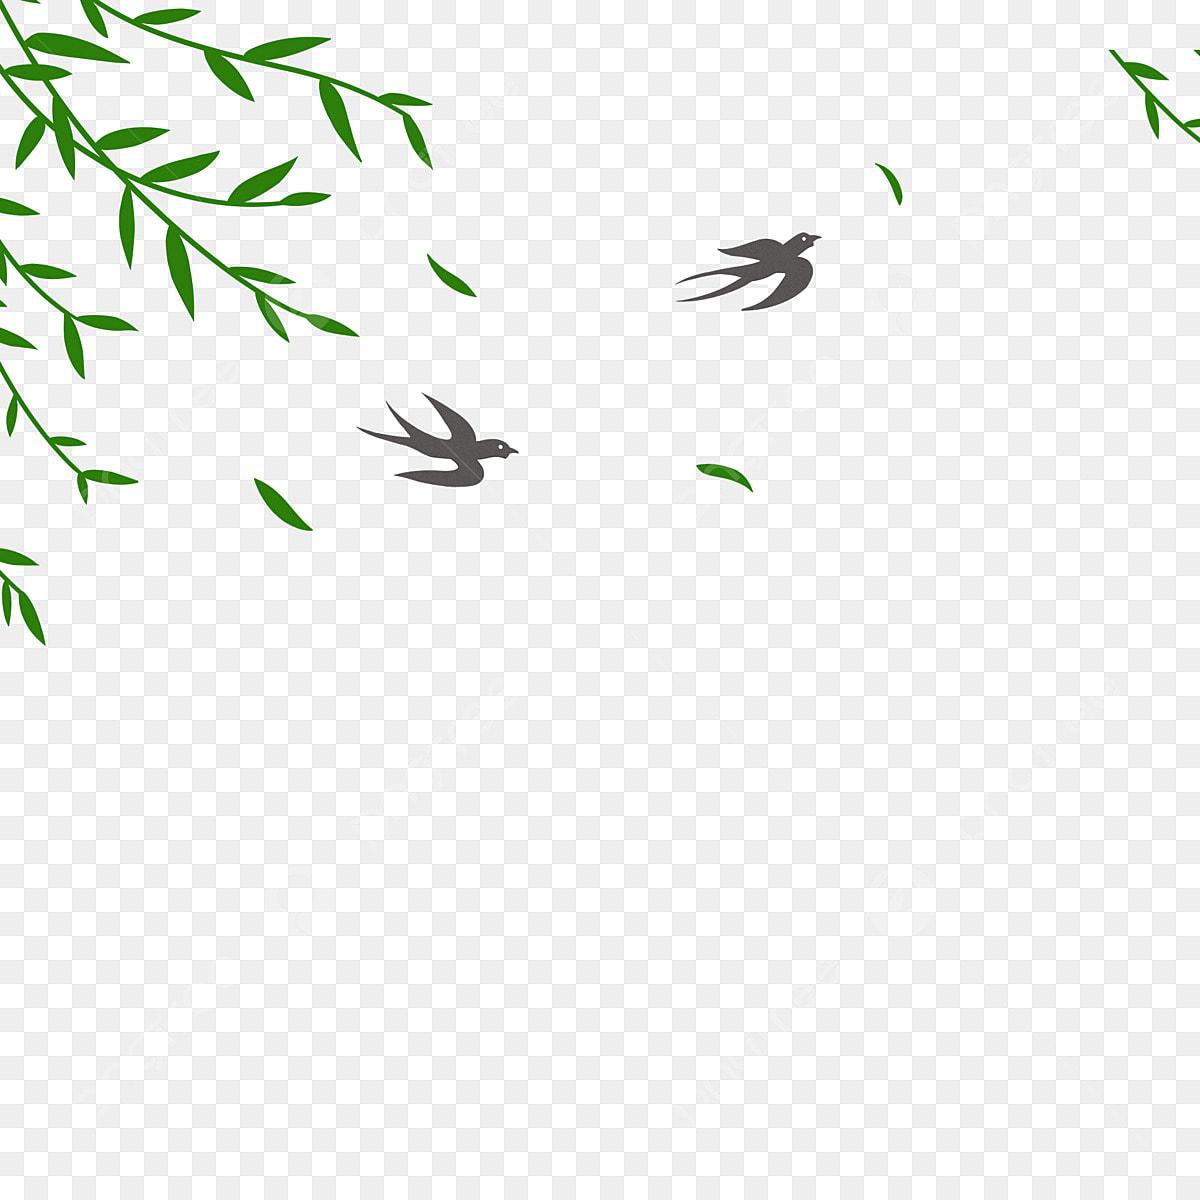 Feuilles De Dessin Anime Feuilles De Saule Environnement Vert